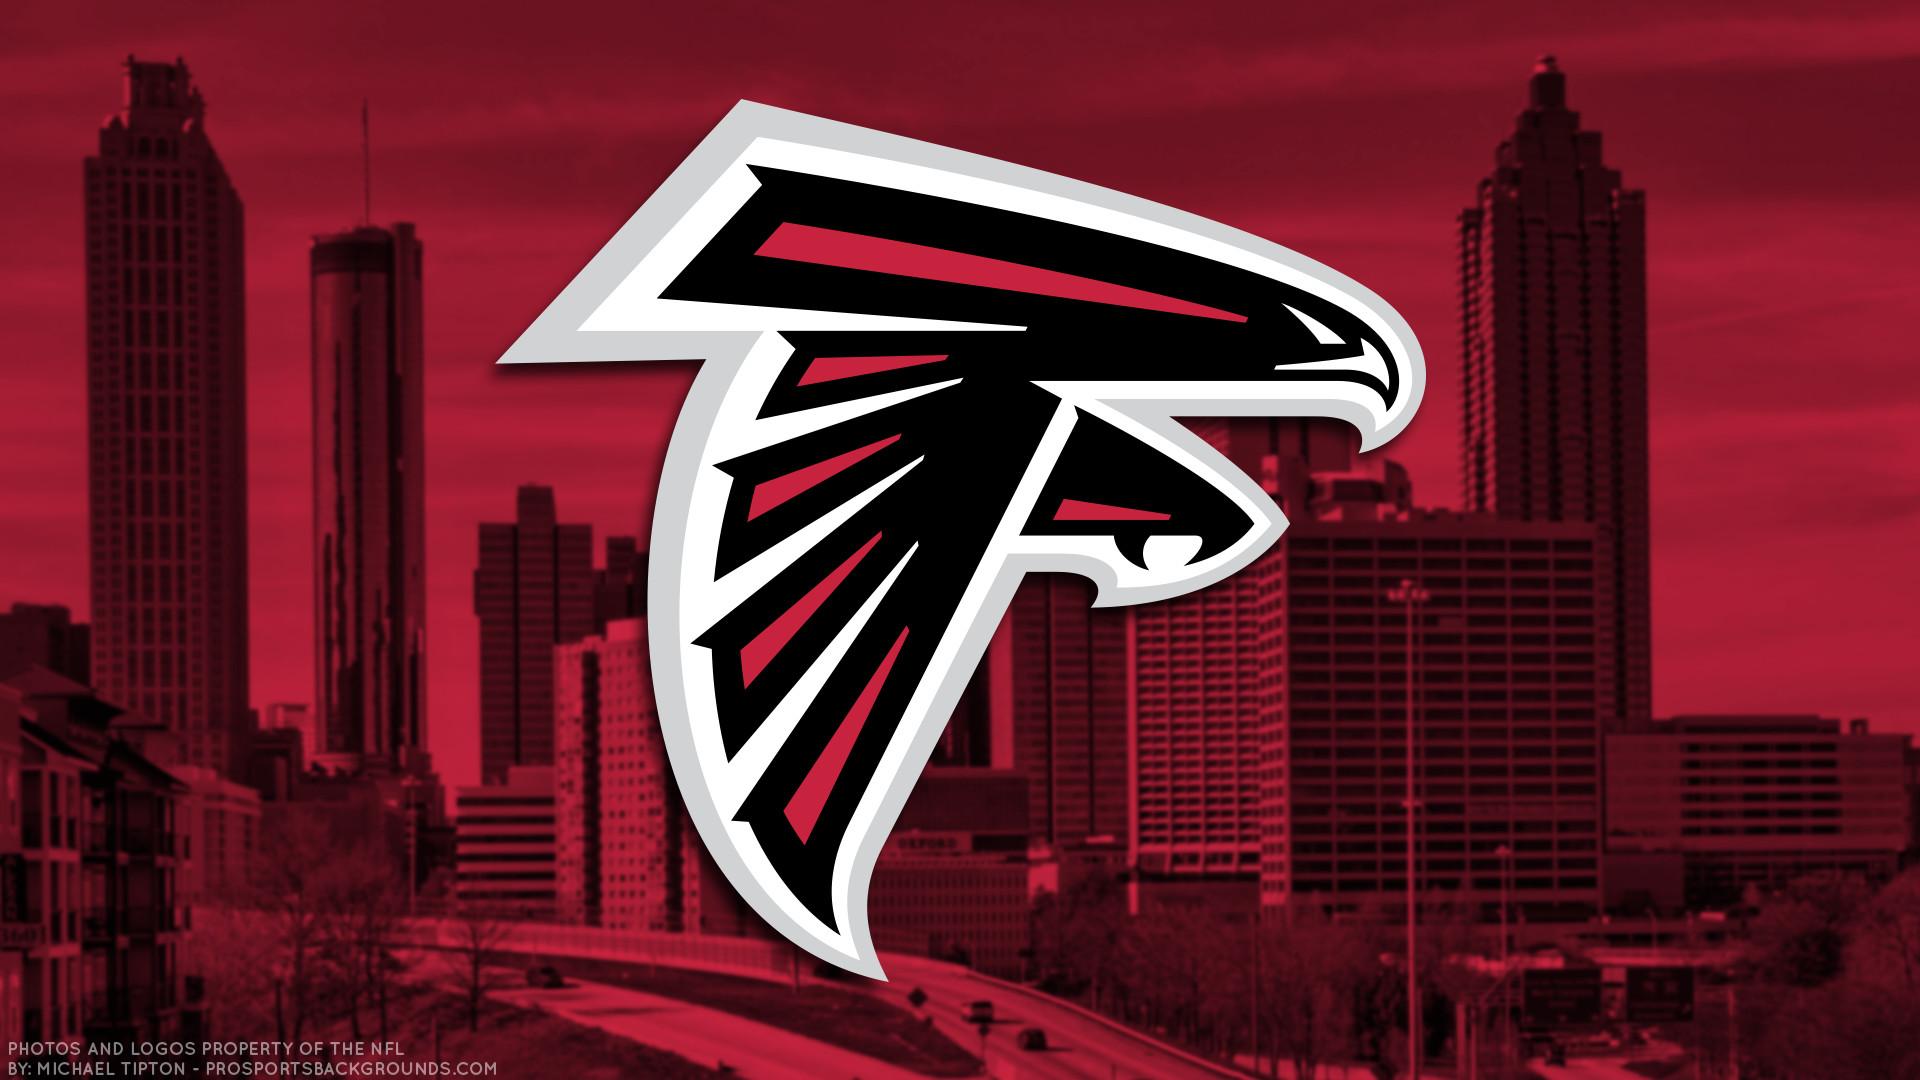 Atlanta Falcons Wallpaper Download Free Cool Full Hd: Atlanta Falcons Wallpaper (67+ Images